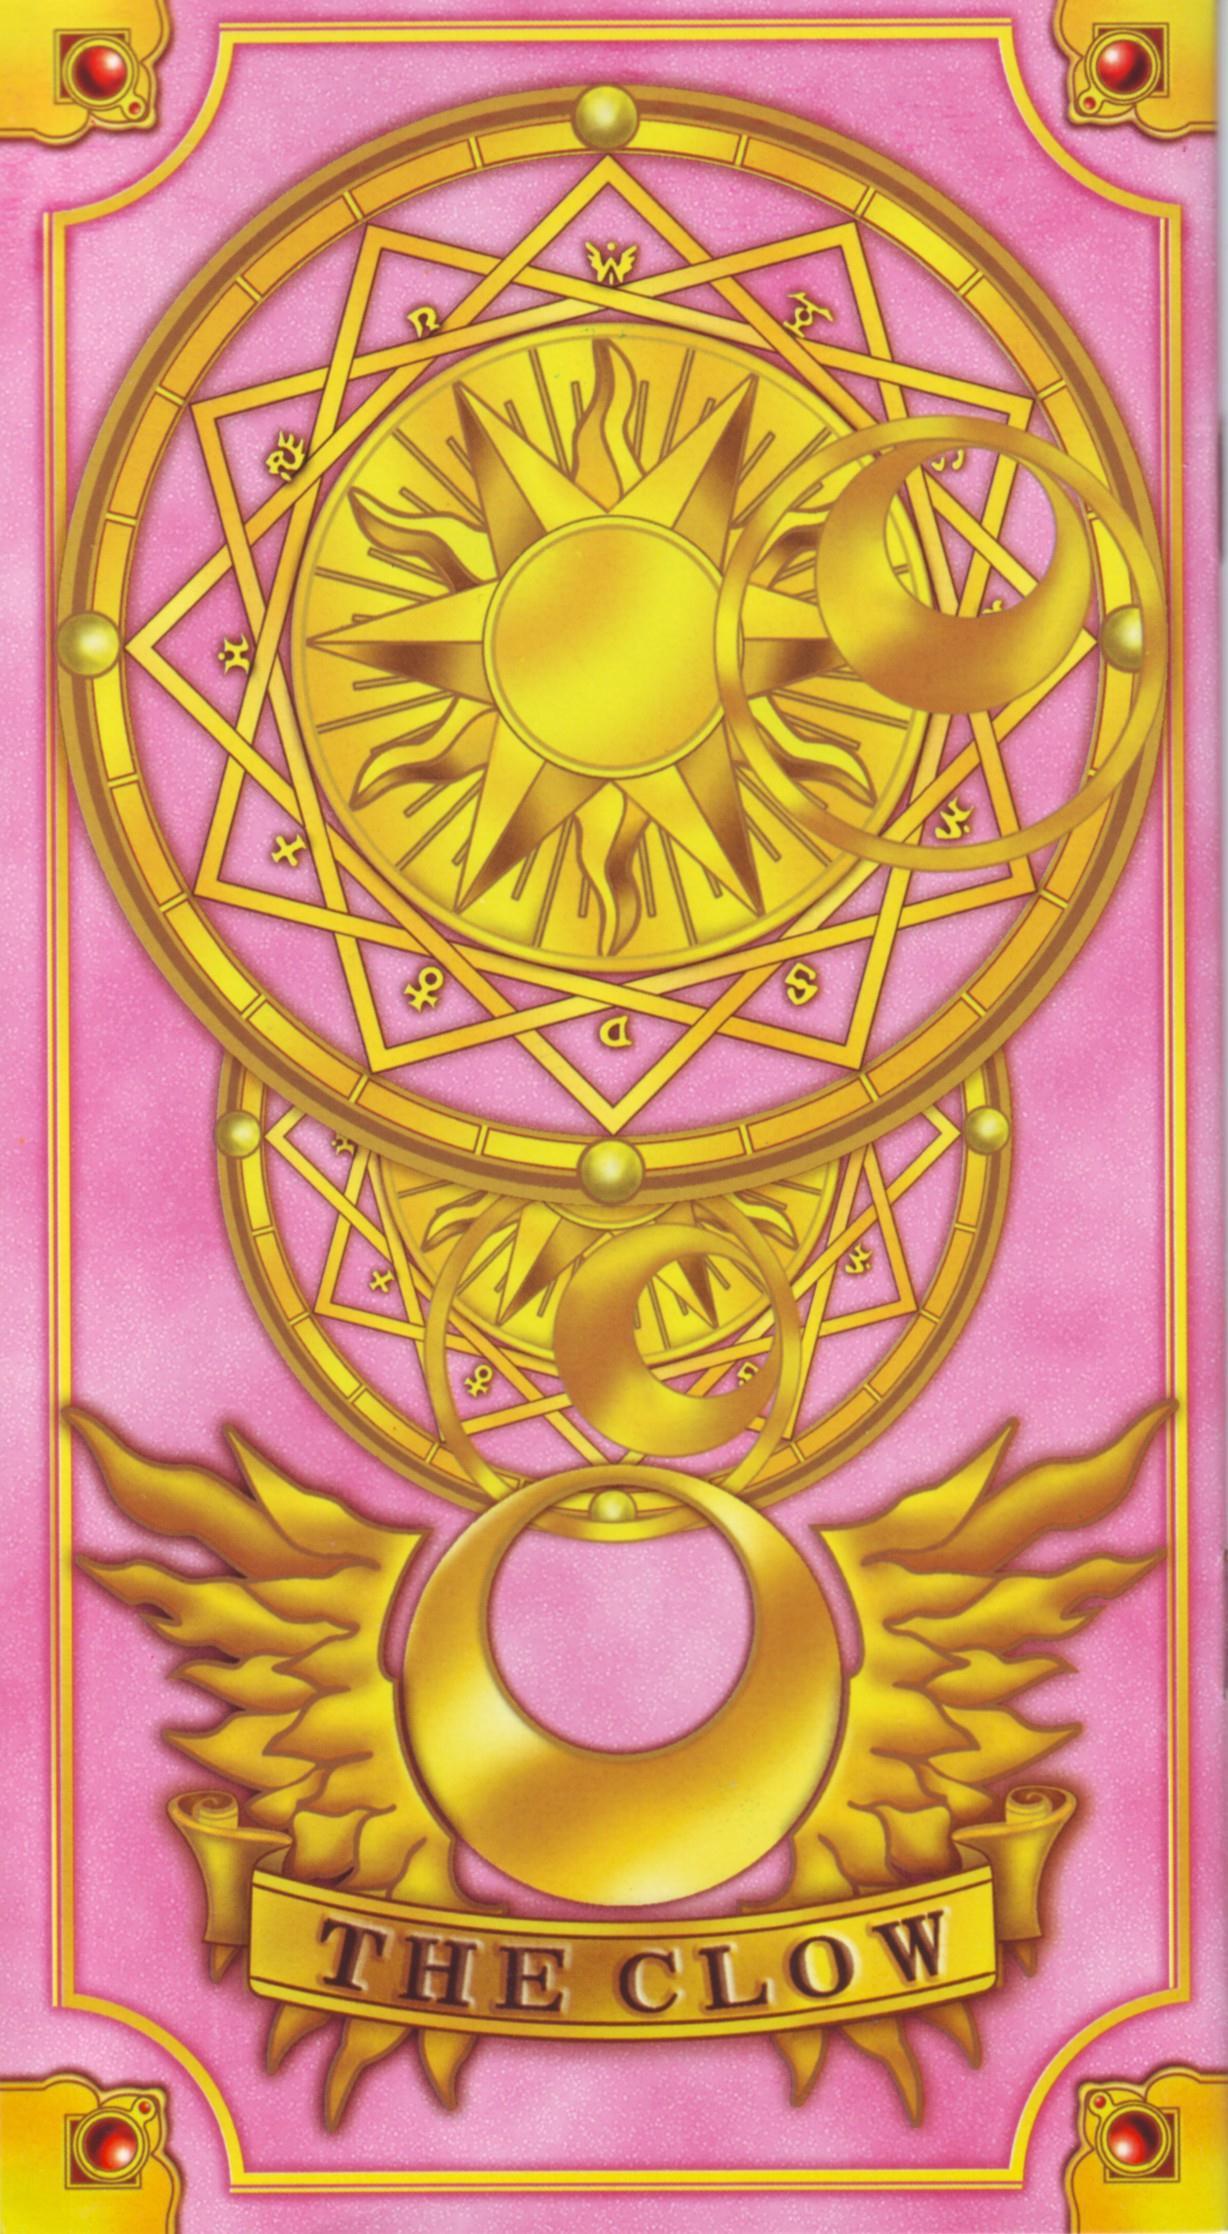 Sakura card captor 34 la luna llena de mediodiacutea - 4 1